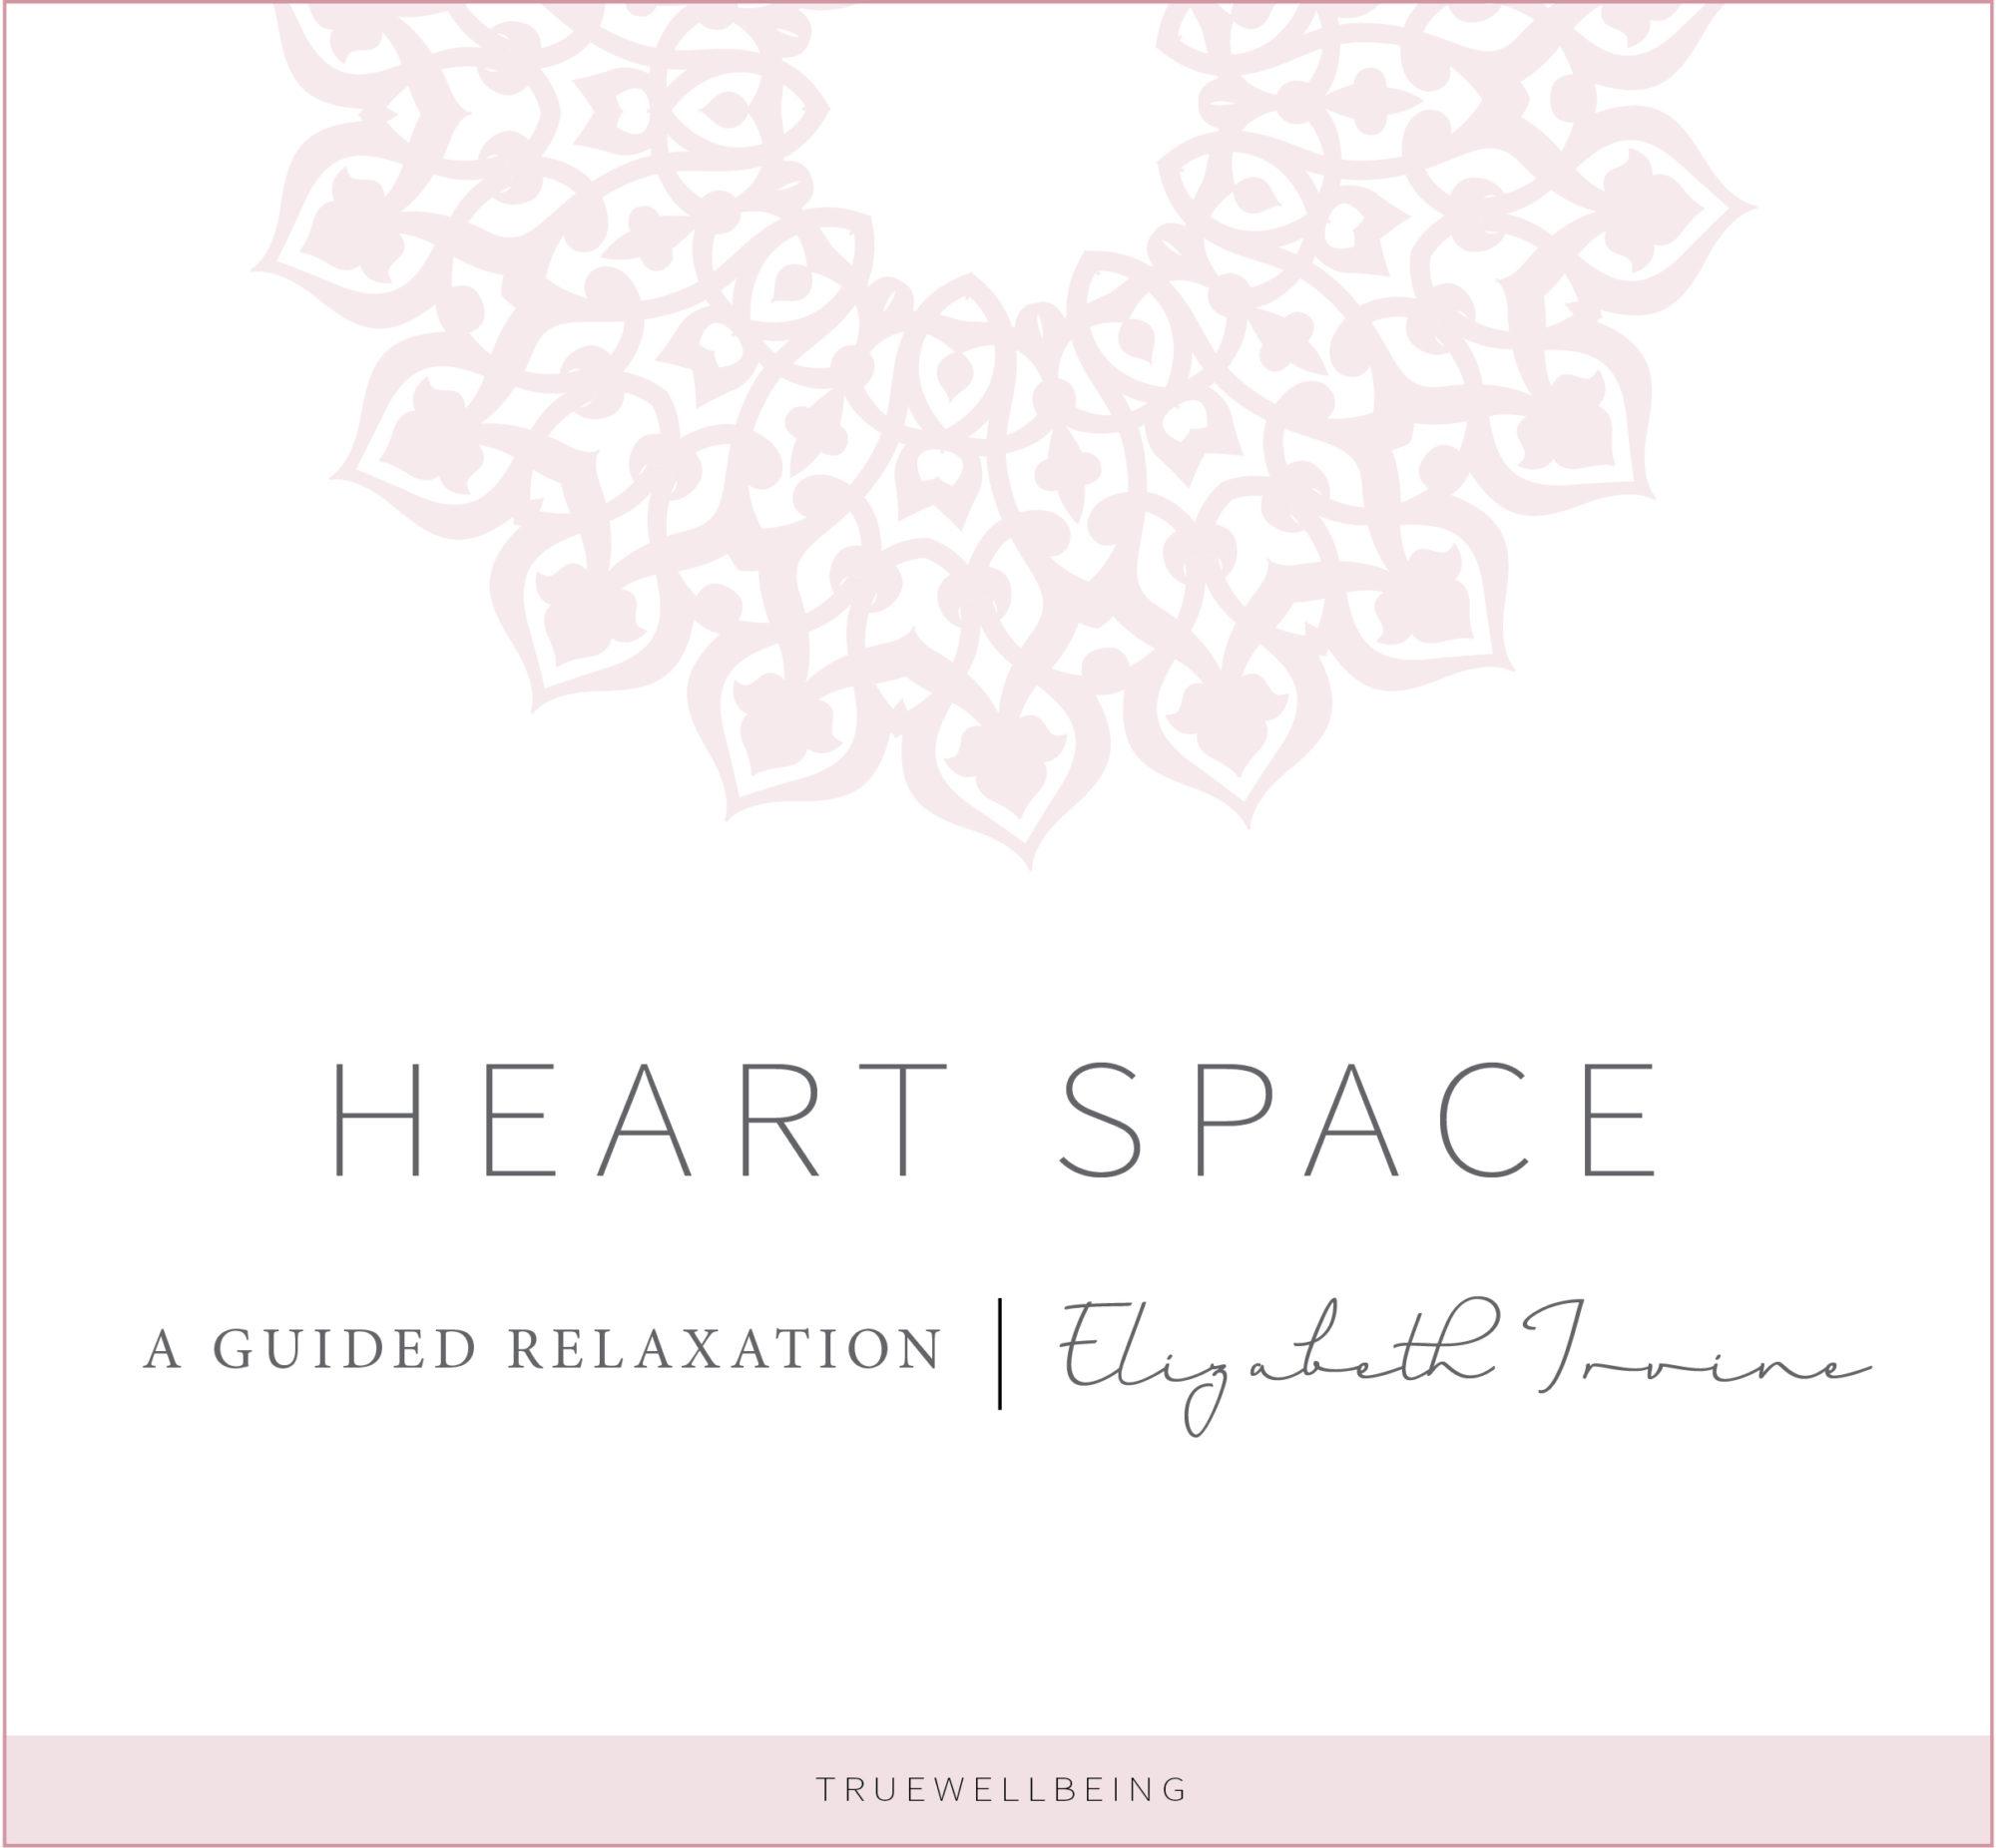 HEART-SPACE-AUDIO-elizabeth-irvine-guided relaxation-meditation.jpg